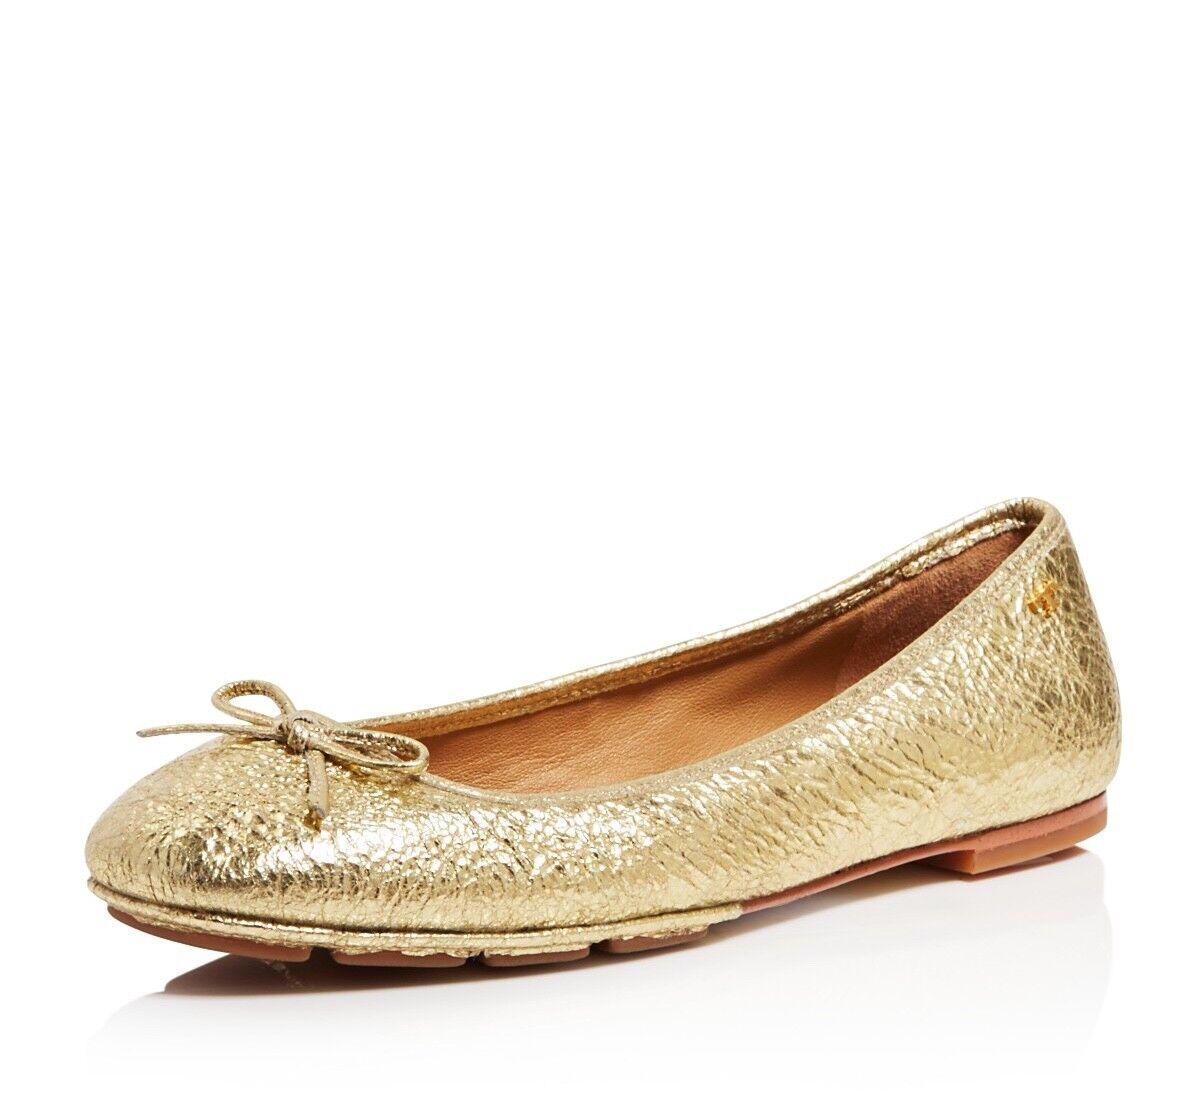 NIB TORY BURCH  198 SPARK or LAILA BALLET DRIVER BALLERINA FLAT chaussures Sz 8